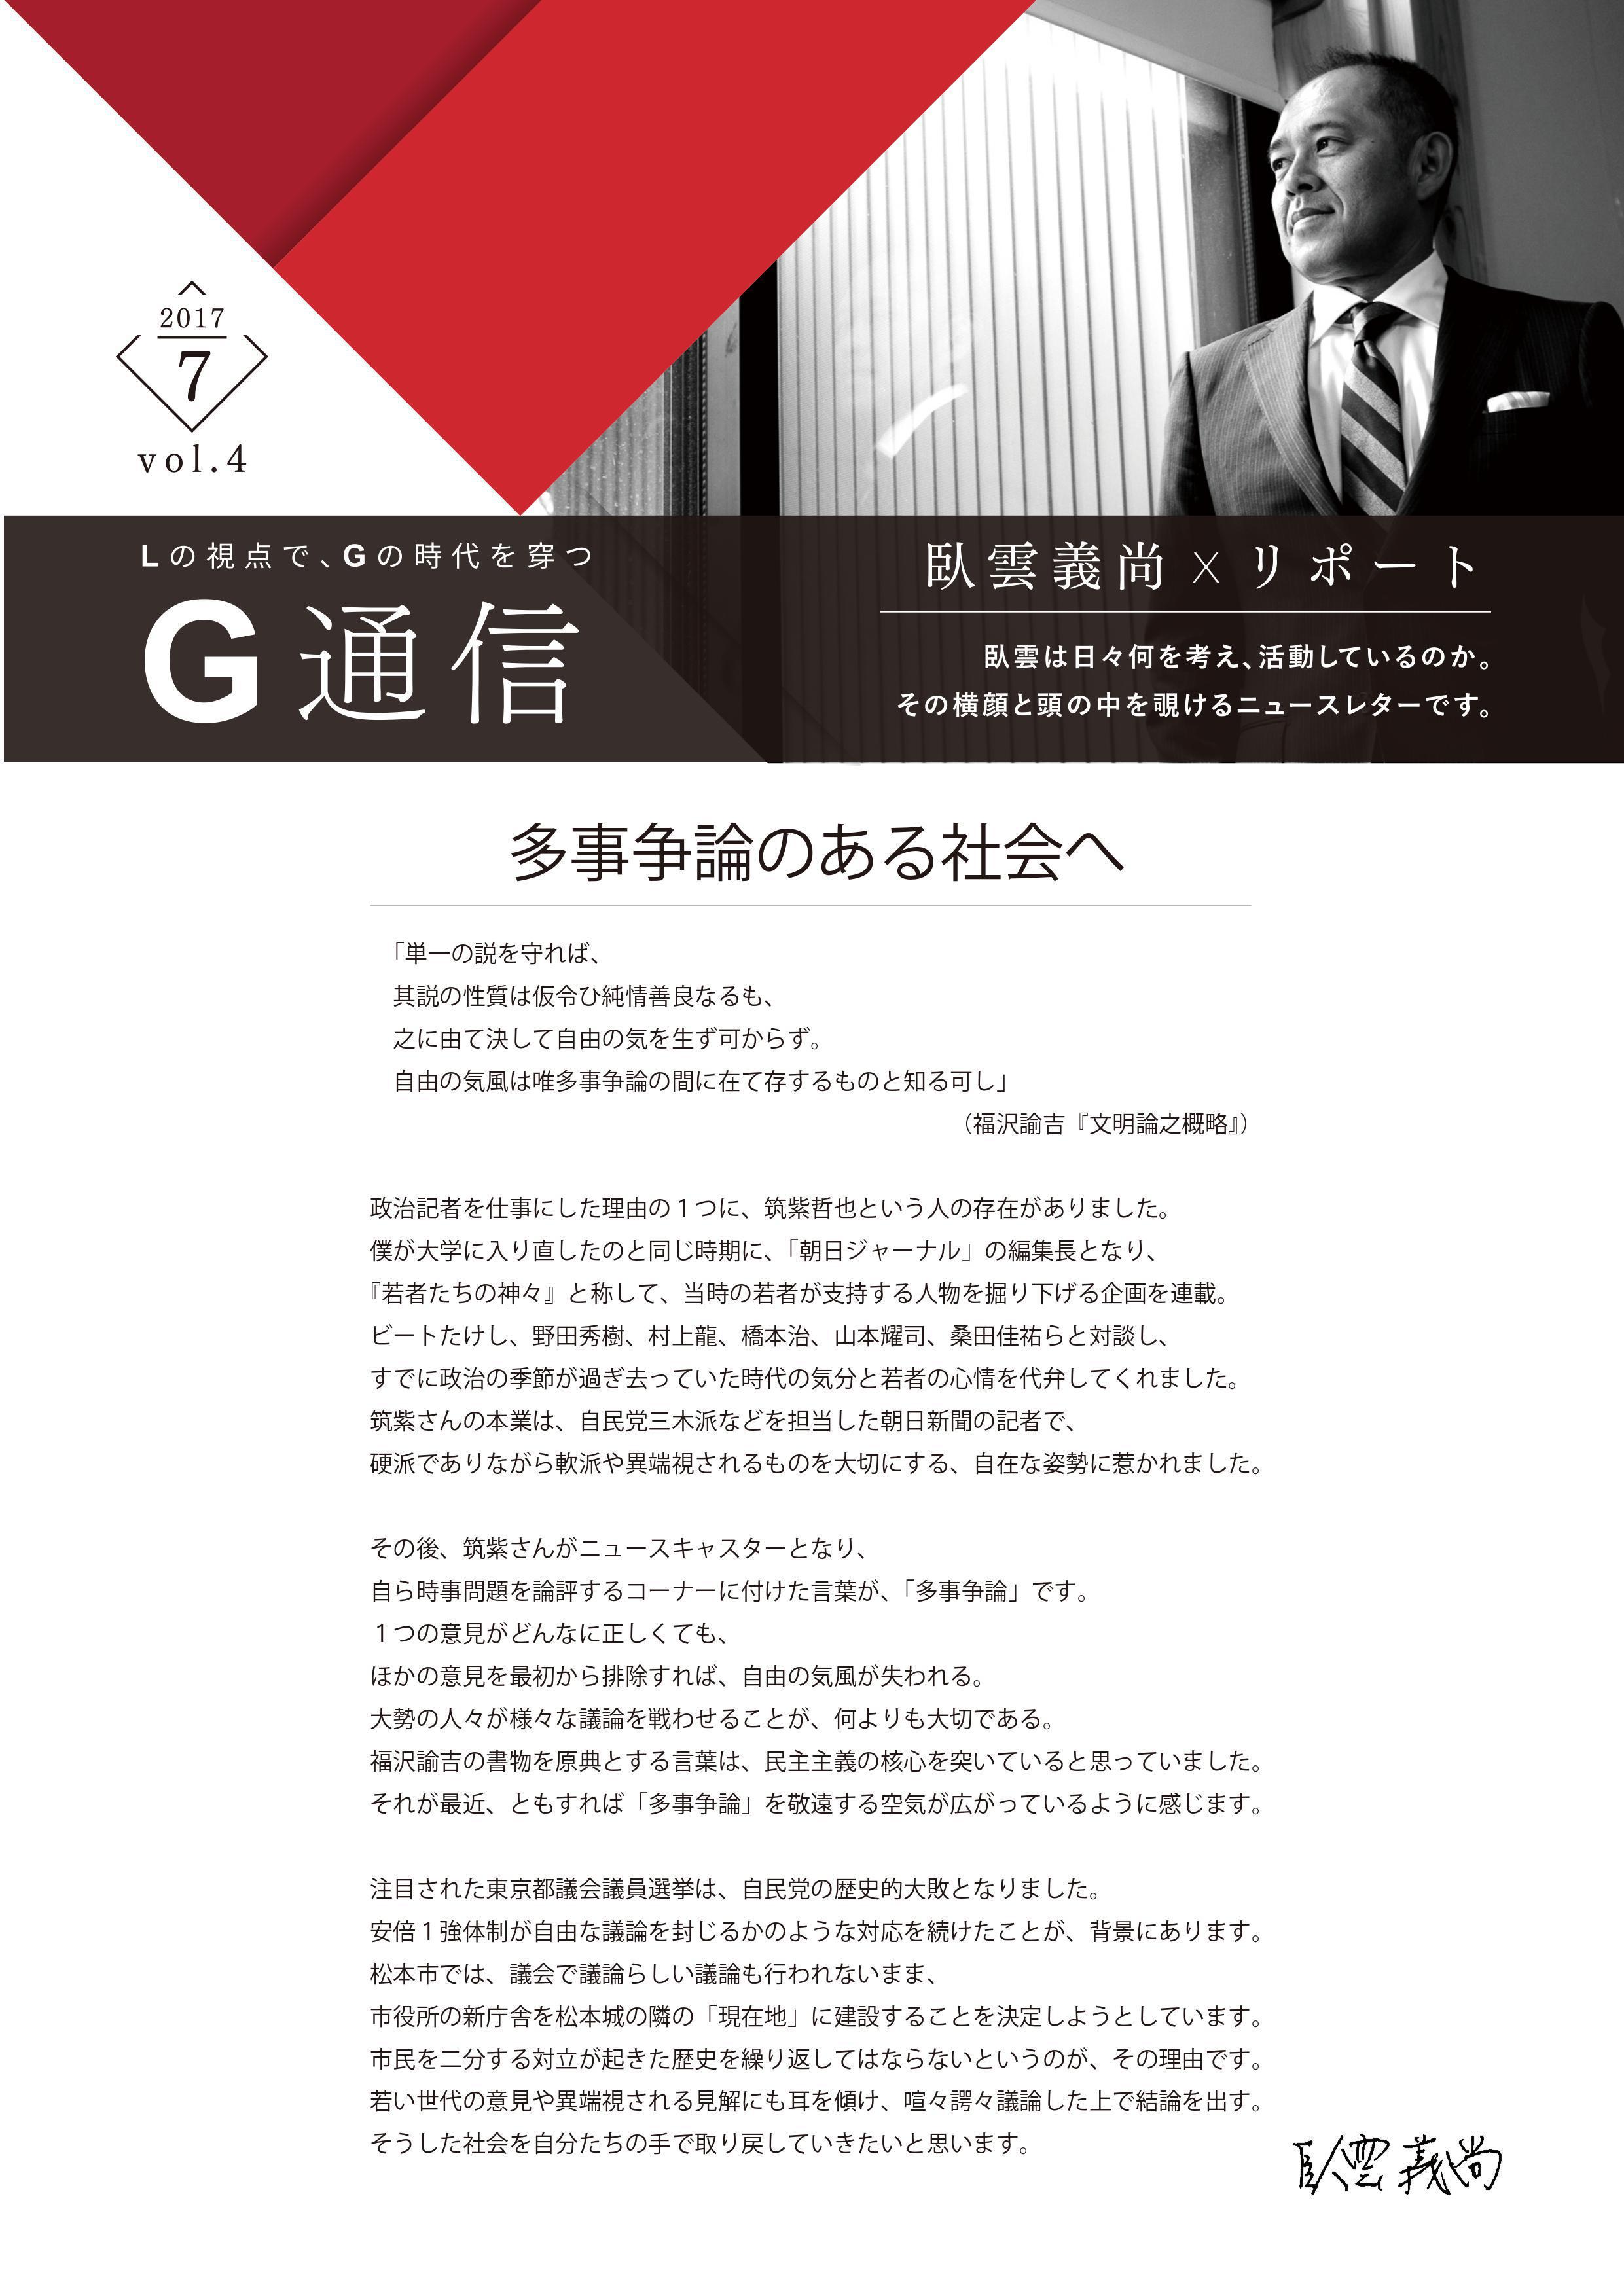 G通信Vol.4  多事争論のある社会へ